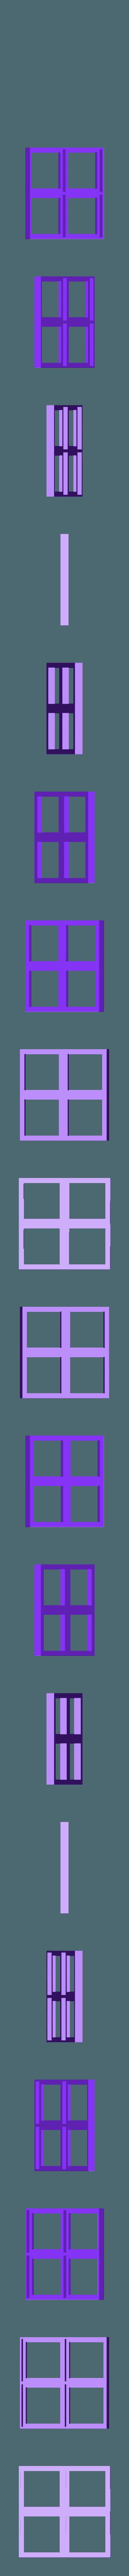 ZDungeon_FloorFrame.stl Download free STL file ZDungeon (experimental dungeon tiles) • 3D printable object, Dutchmogul